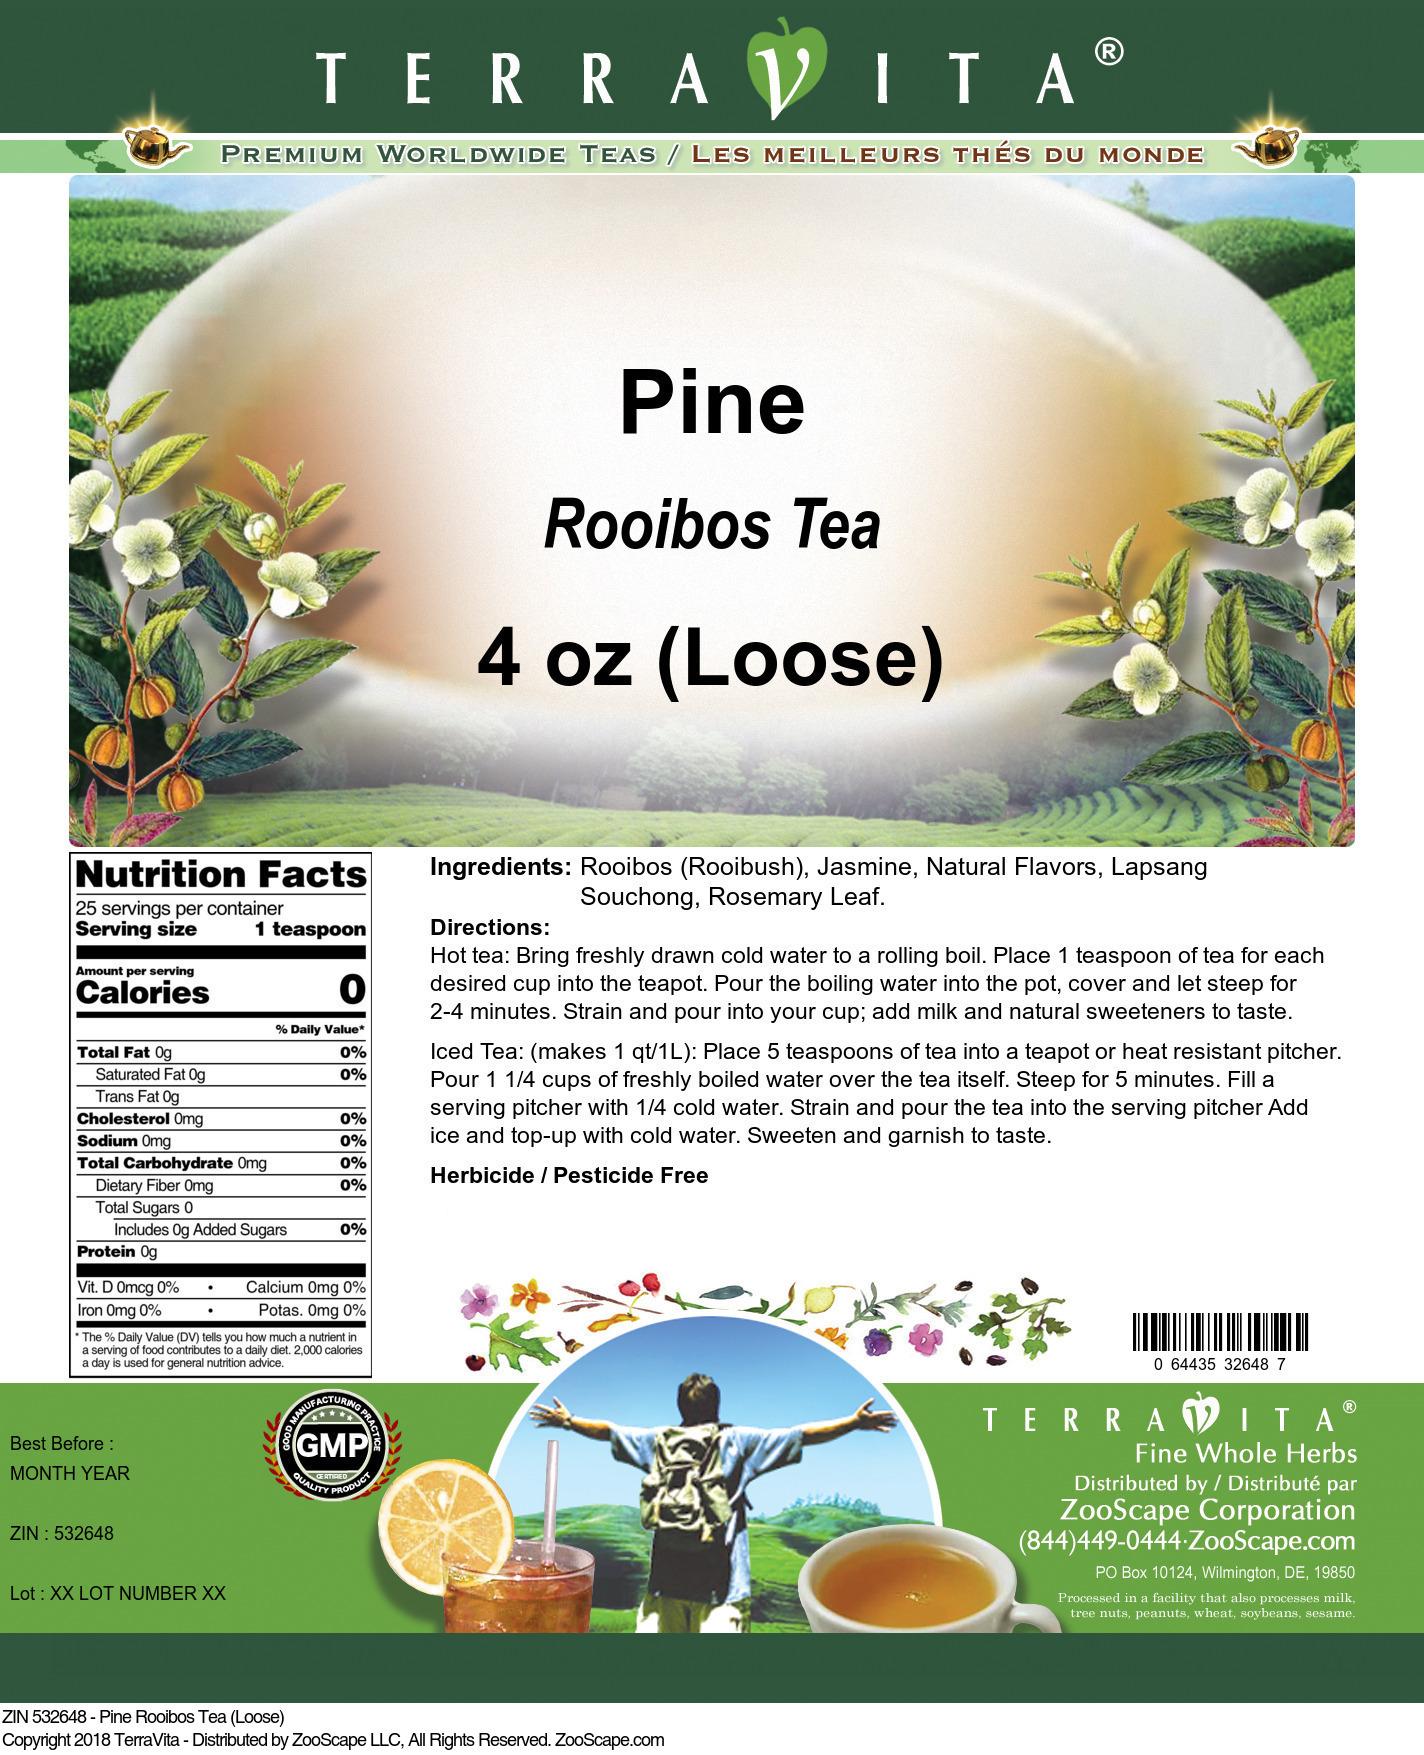 Pine Rooibos Tea